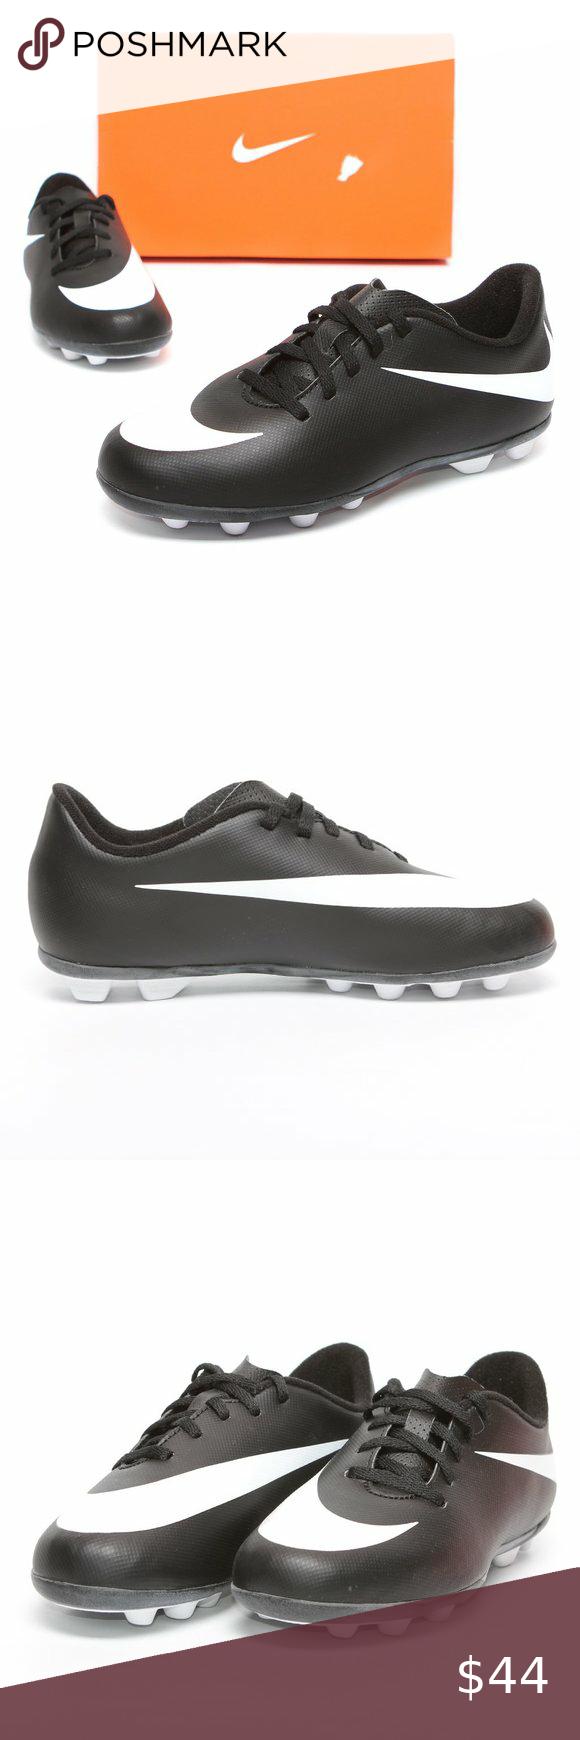 us 2y shoe size